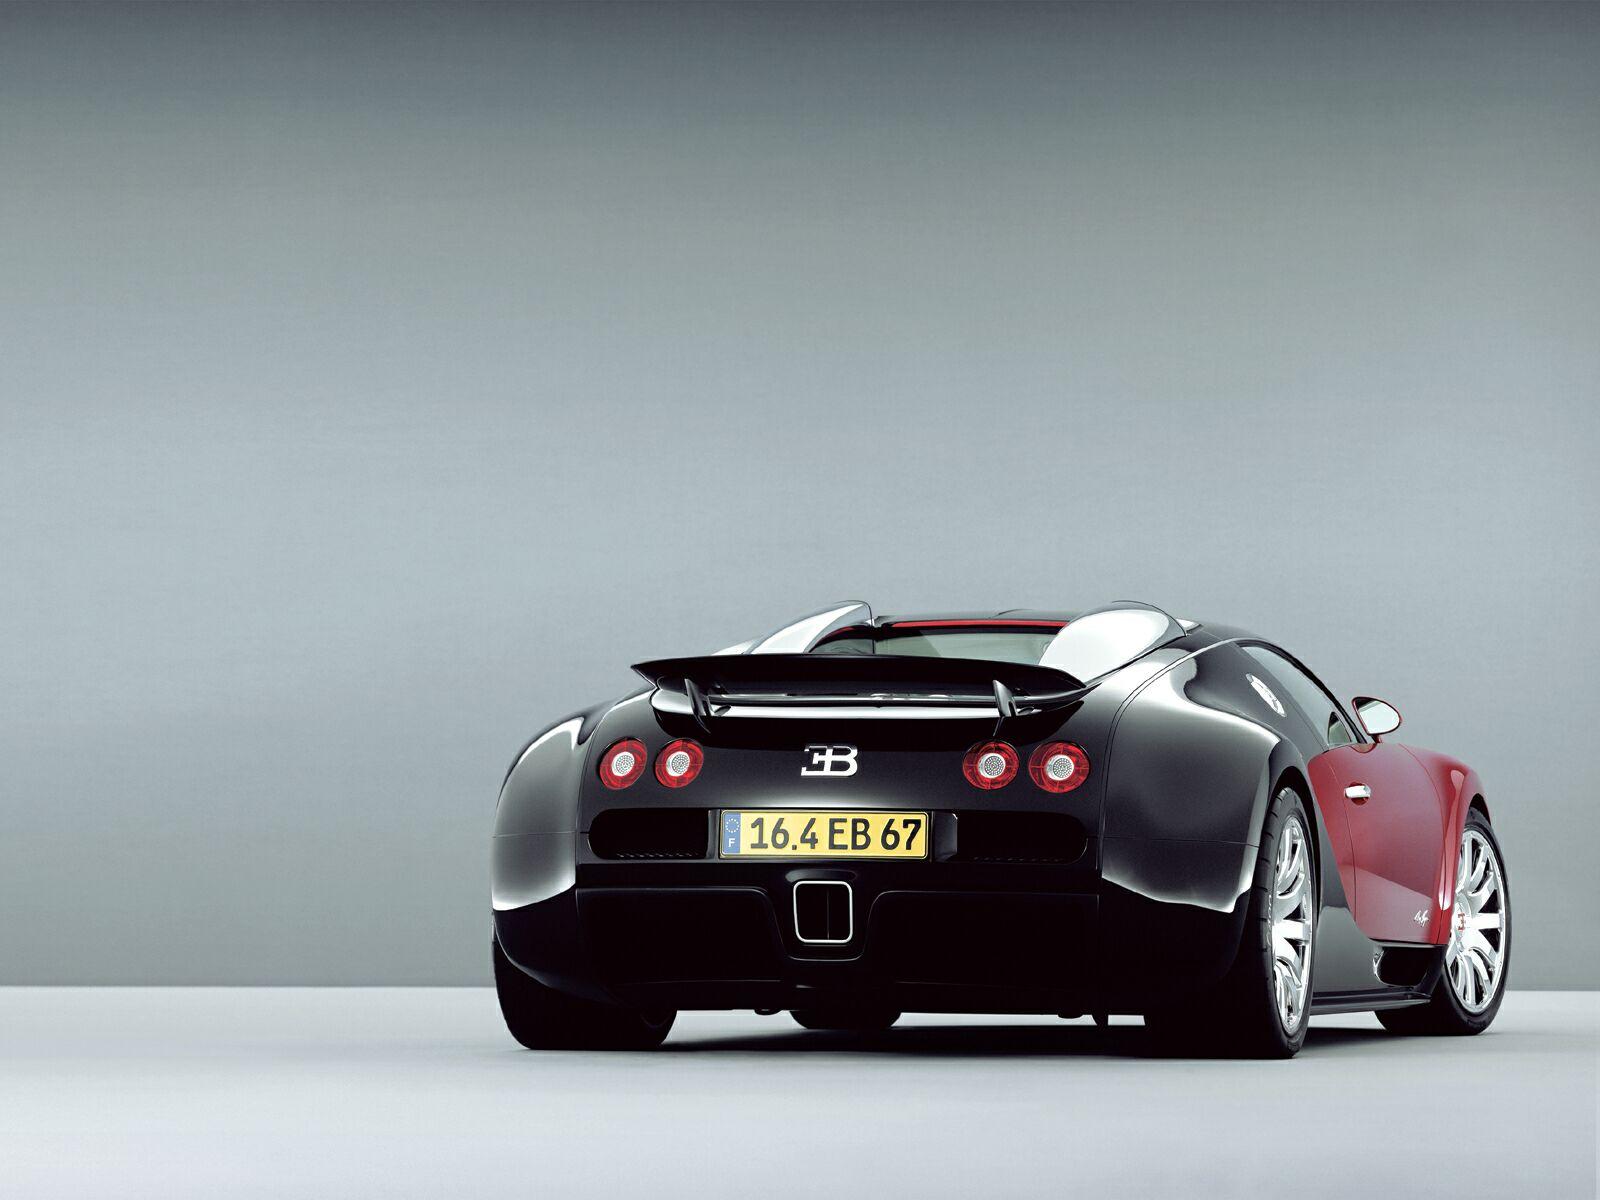 http://1.bp.blogspot.com/_GCAuqodmOE4/TJ__VF7ZfNI/AAAAAAAAB48/utCM-aY4E50/s1600/Bugatti-Veyron-004.jpg